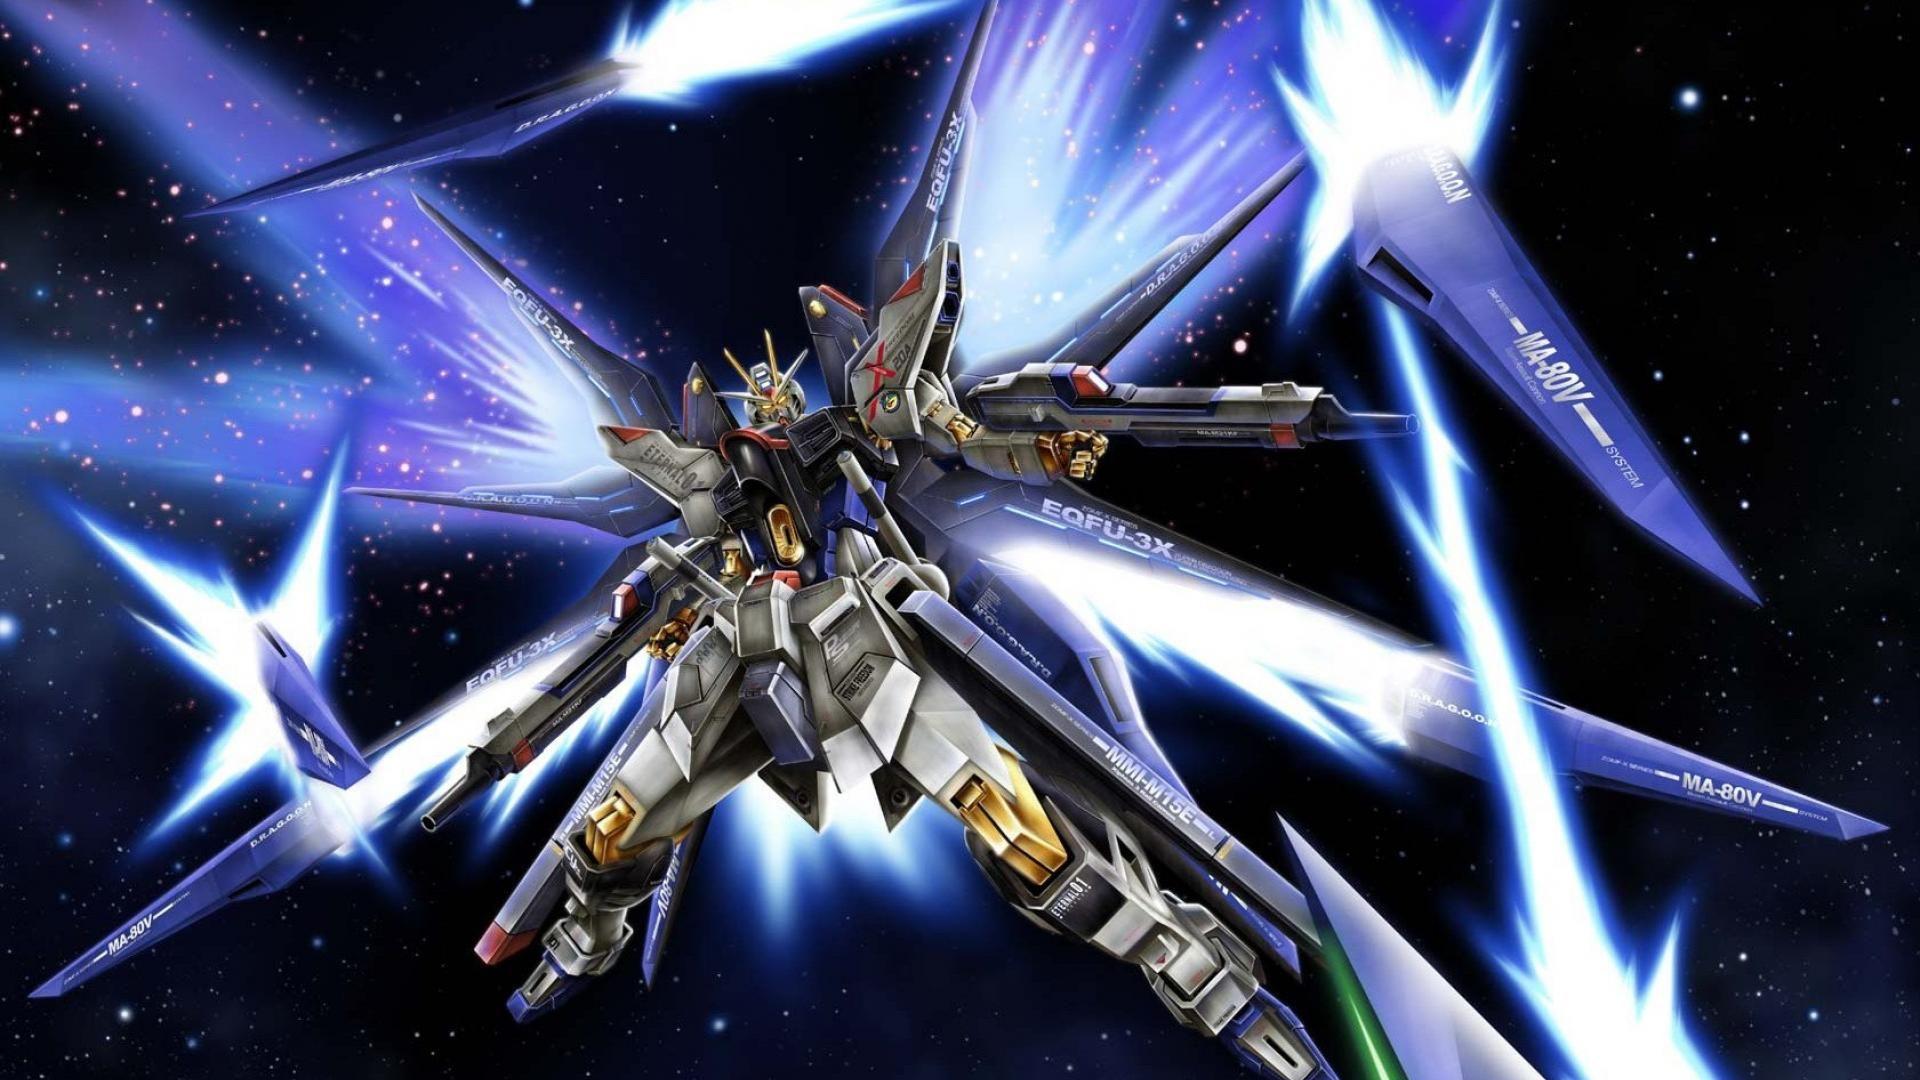 Glamorous Anime Gundam Wallpaper Hd 1920x1080px Nice Px Gundam